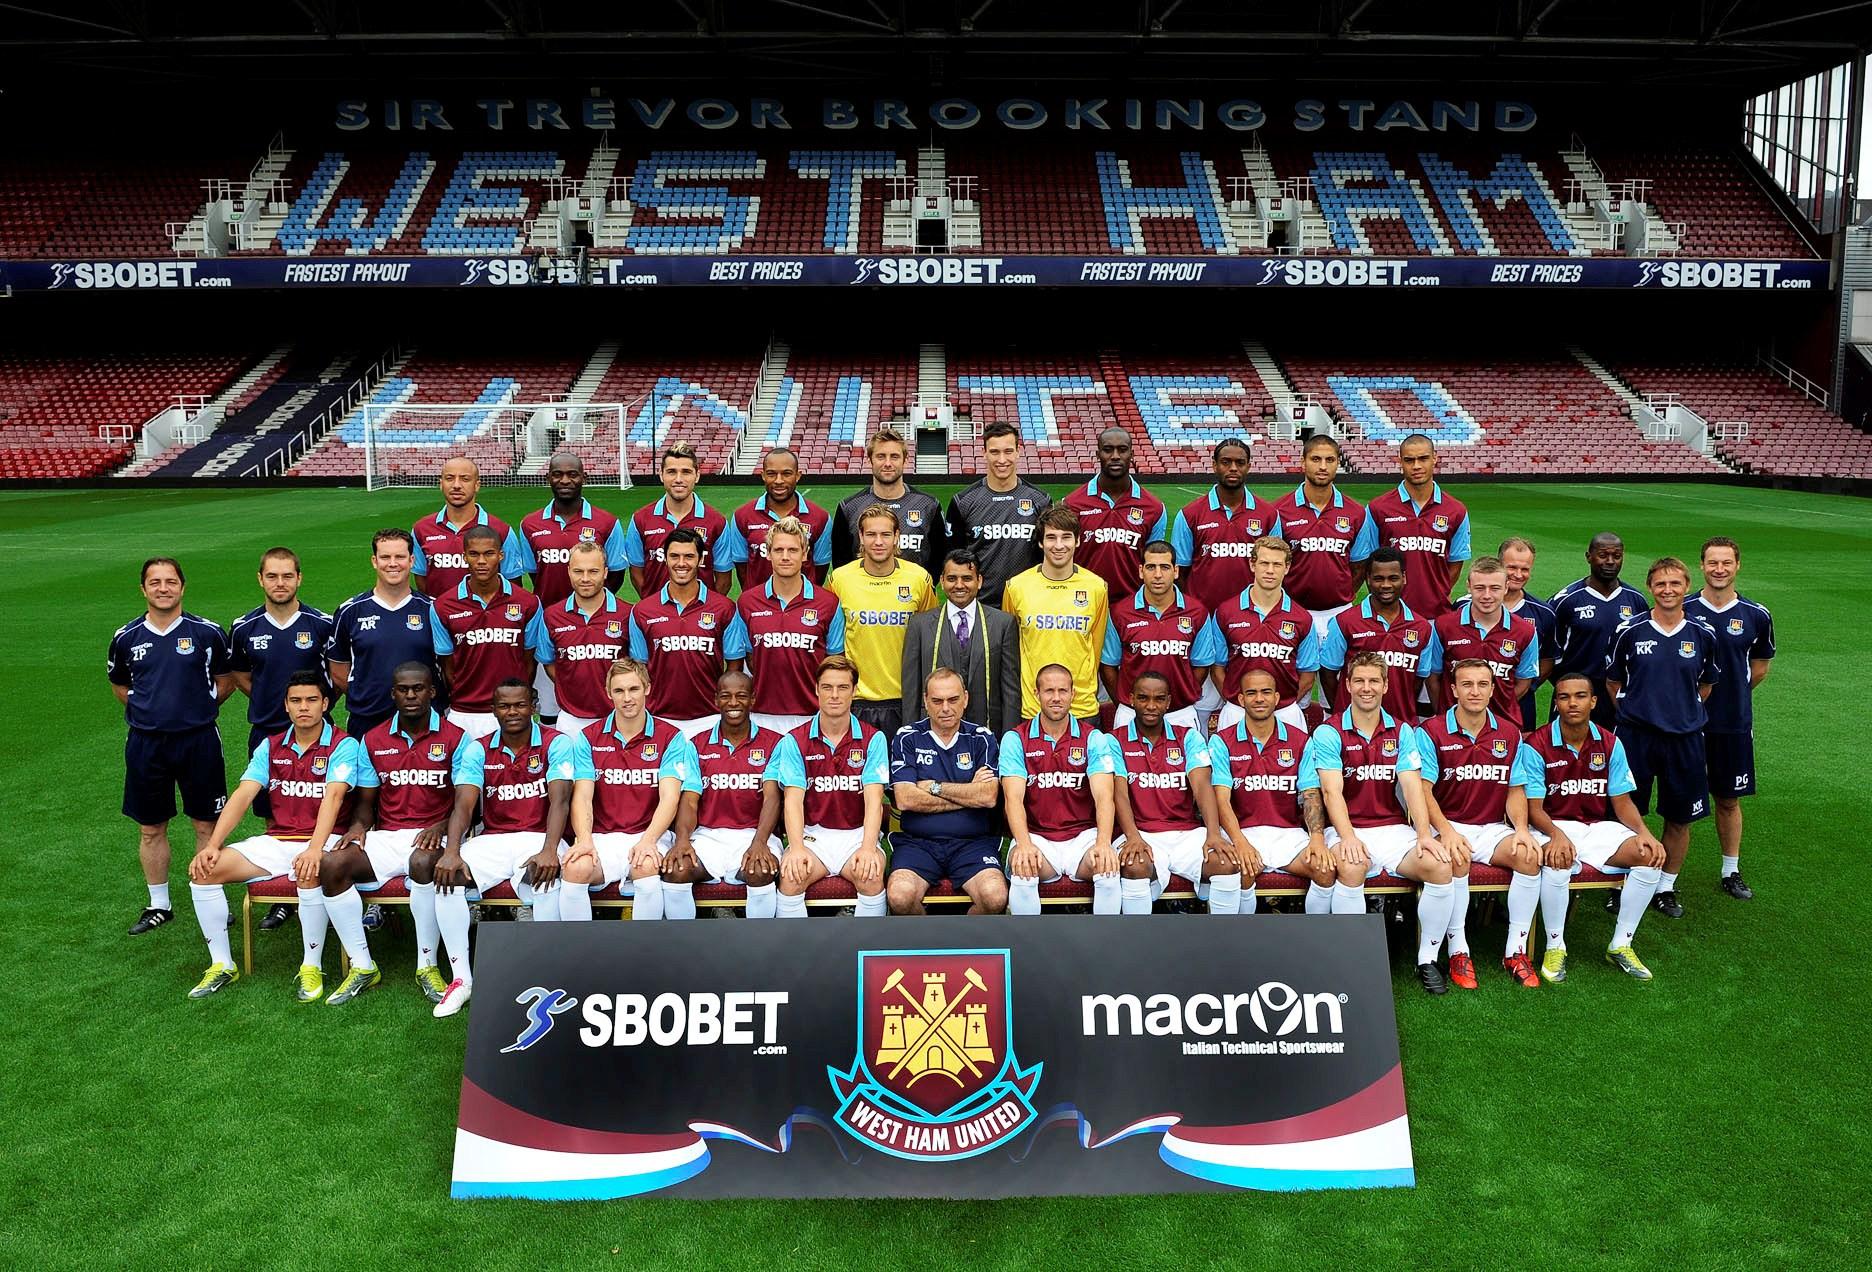 Фото футбольного клуба вест хэм